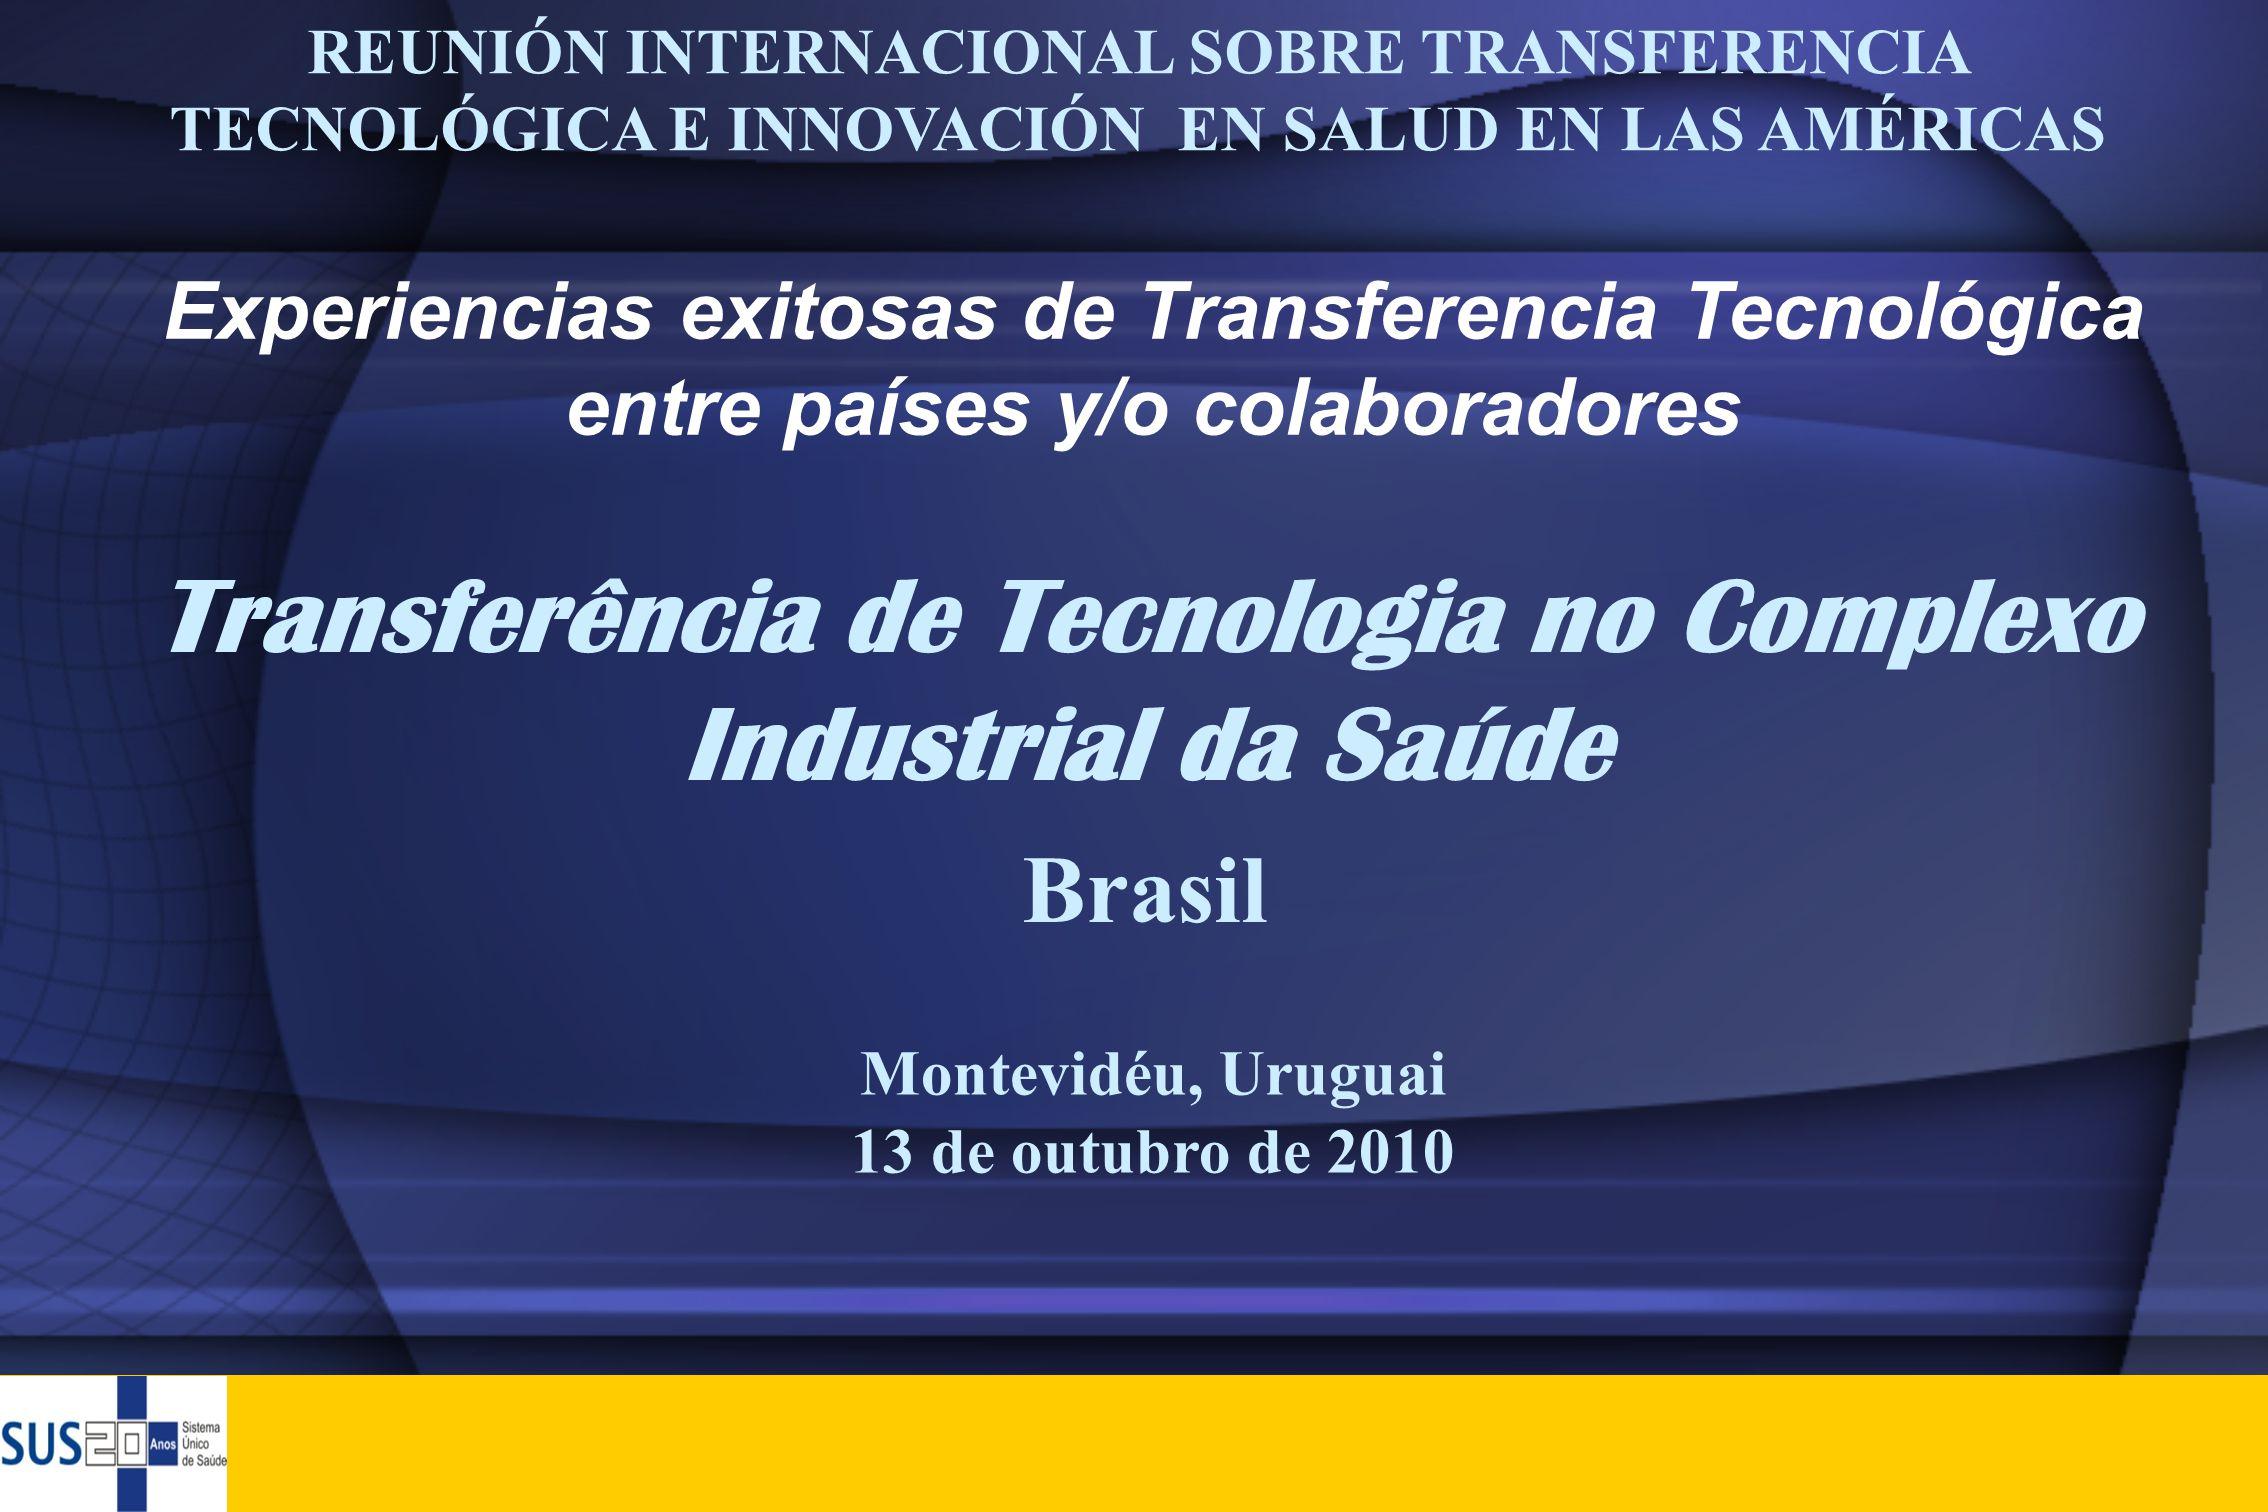 Experiencias exitosas de Transferencia Tecnológica entre países y/o colaboradores Montevidéu, Uruguai 13 de outubro de 2010 REUNIÓN INTERNACIONAL SOBR